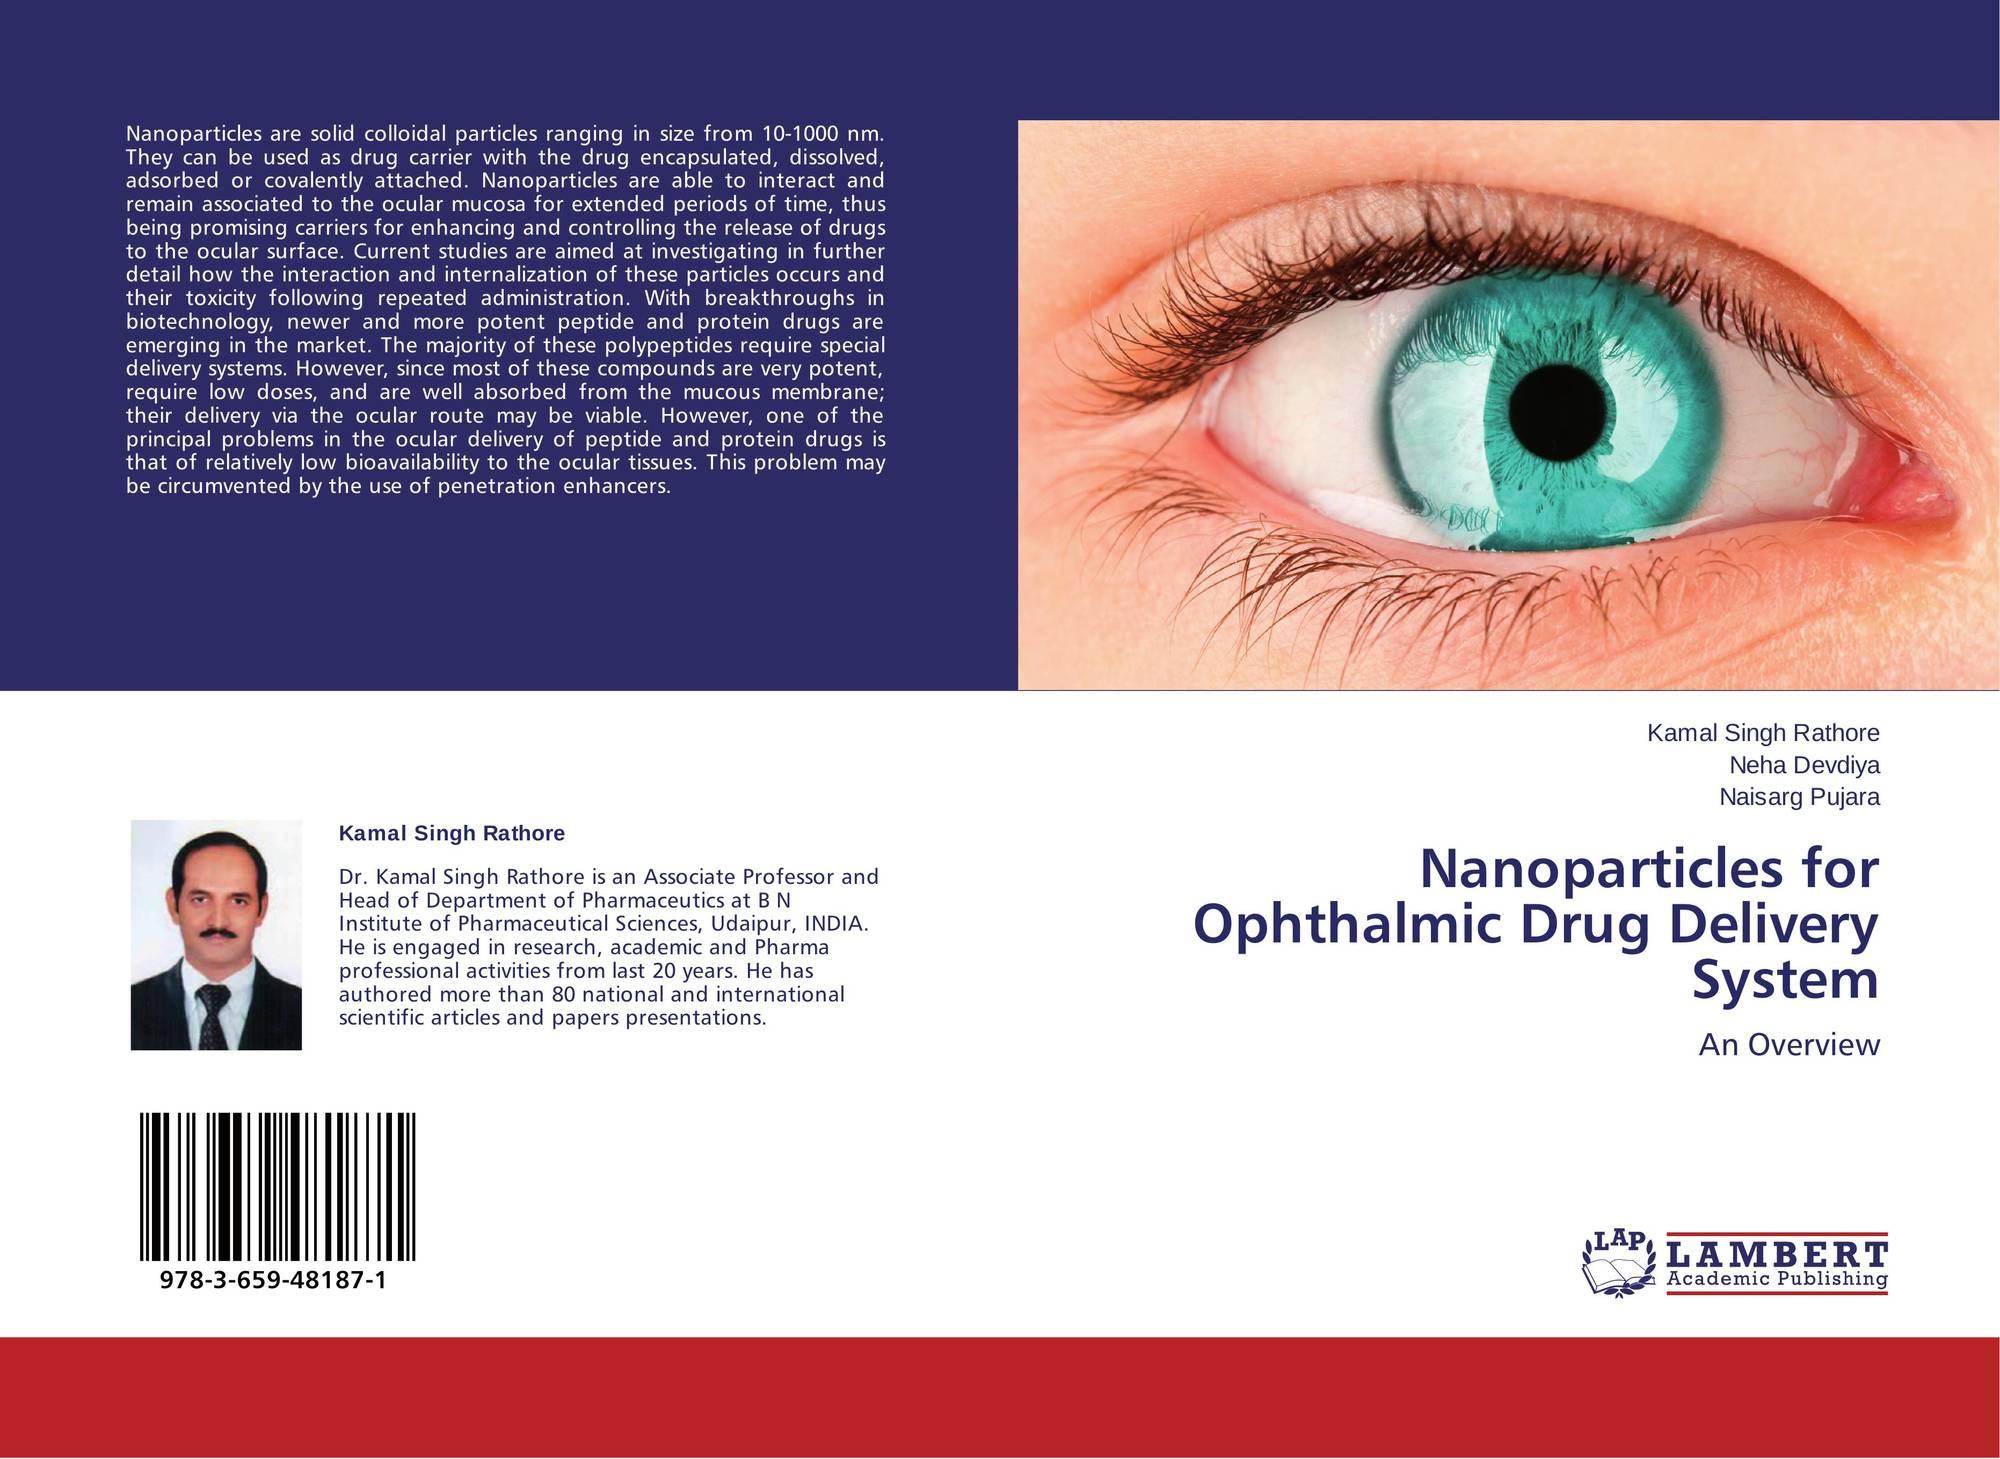 Treatise on Ocular Drug Delivery